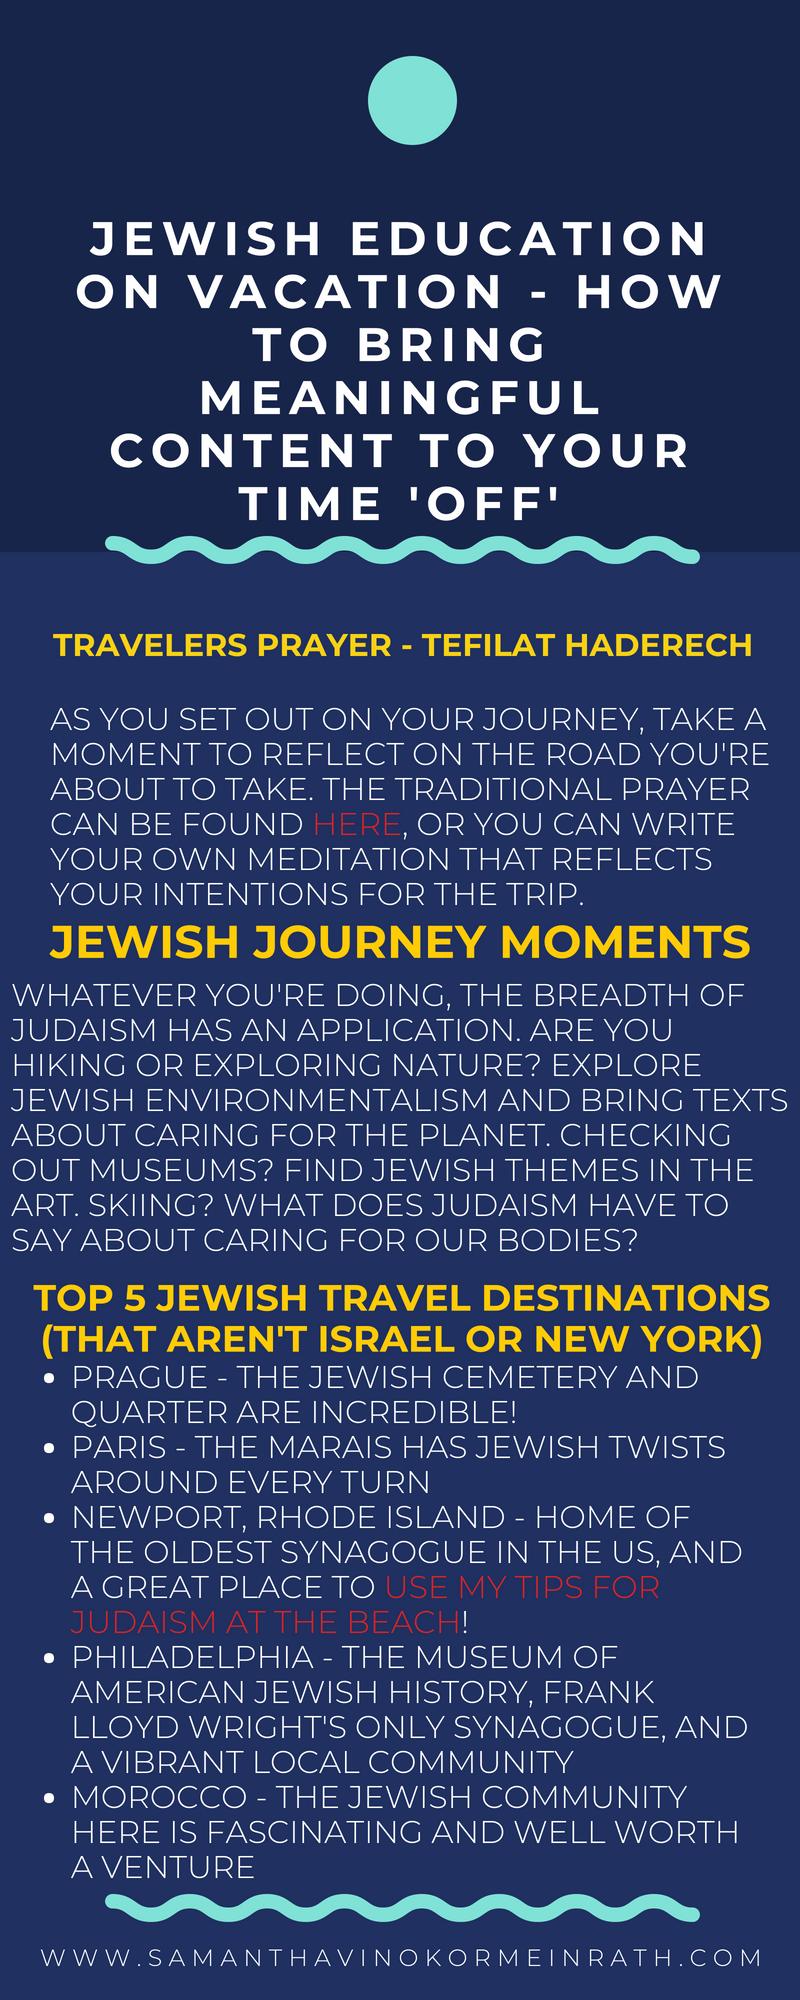 Jewish education on vacation